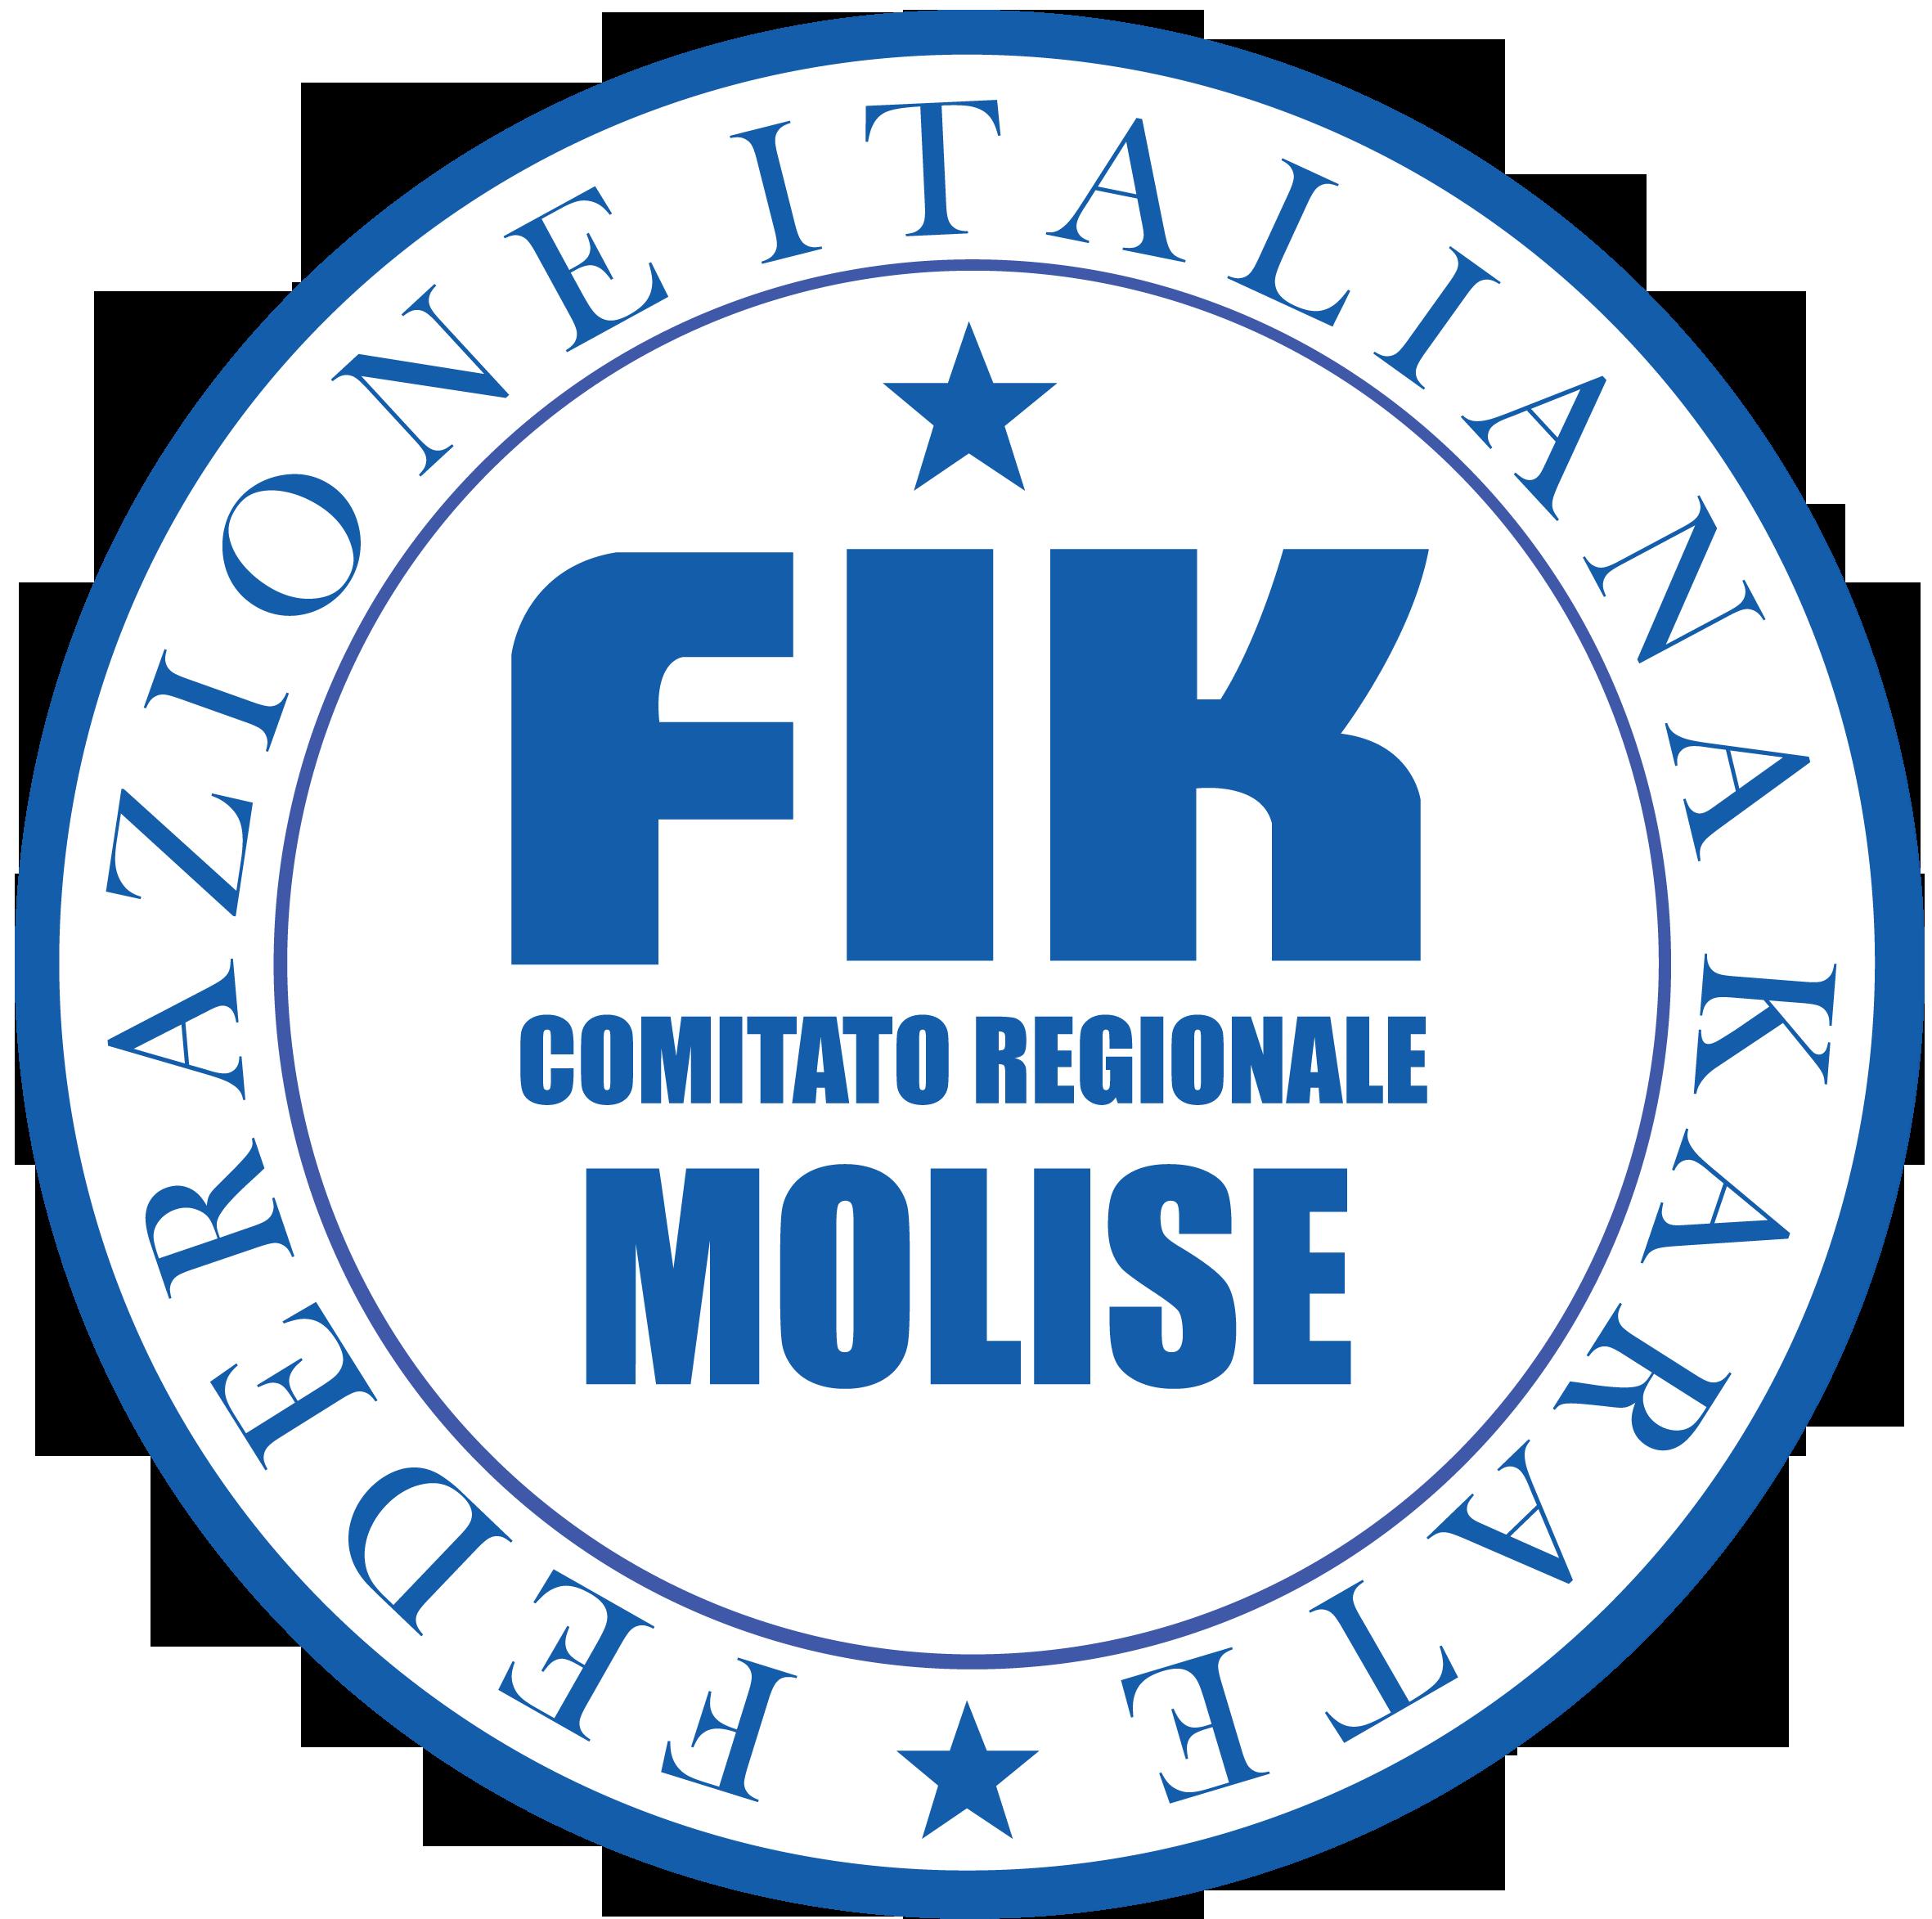 Comitato Regionale Molise